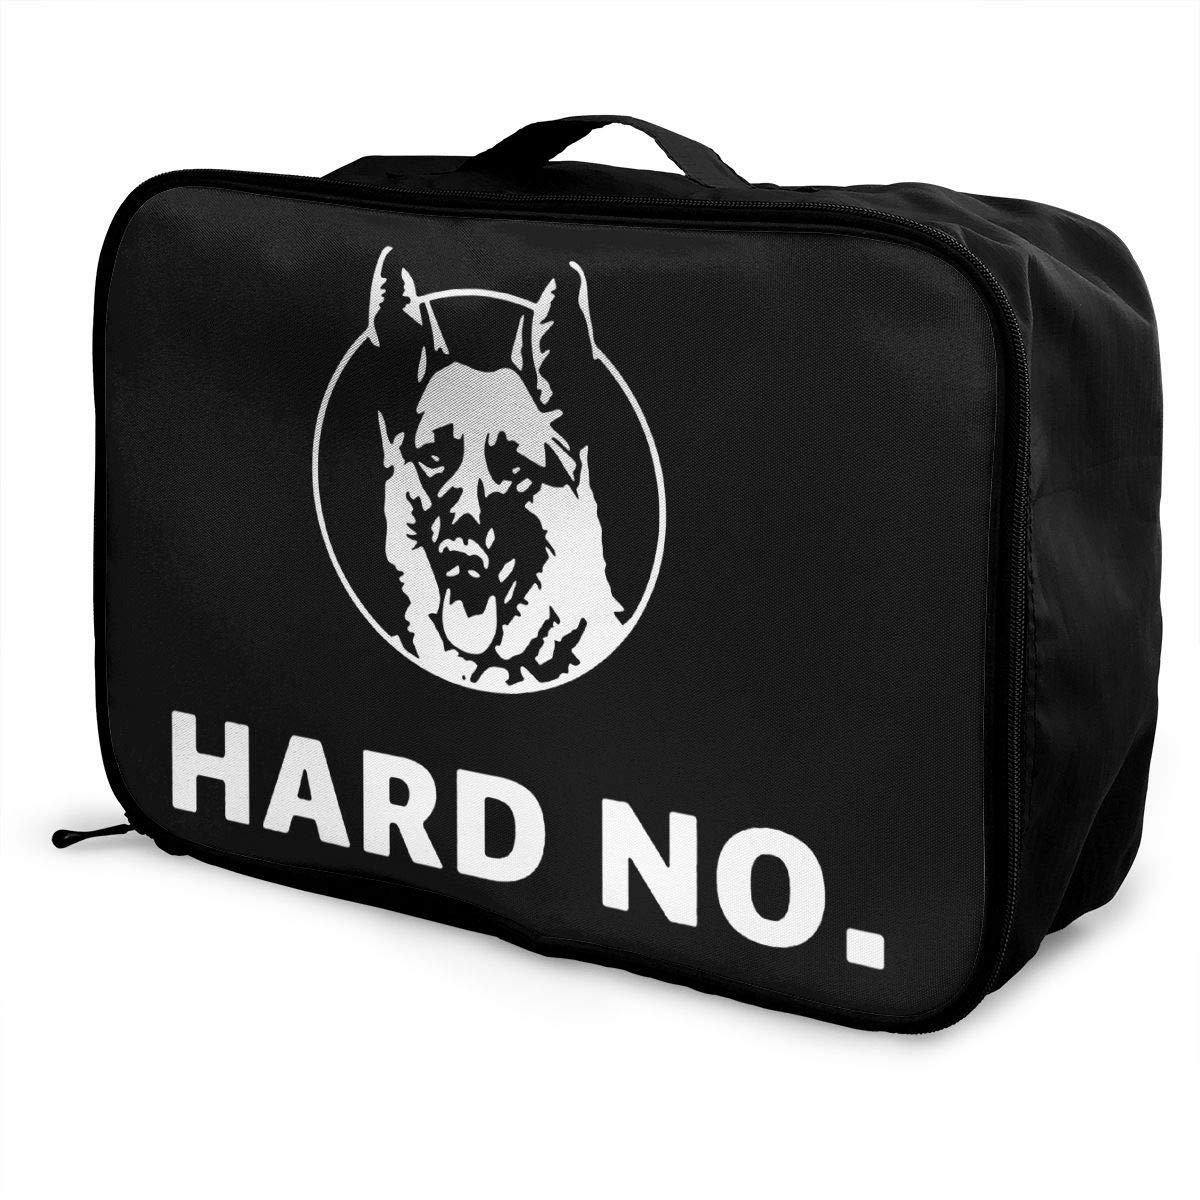 Letterkenny Hard No Travel Bag Men Women 3D Print Pattern Gift Portable Waterproof Oxford Cloth Luggage Bag